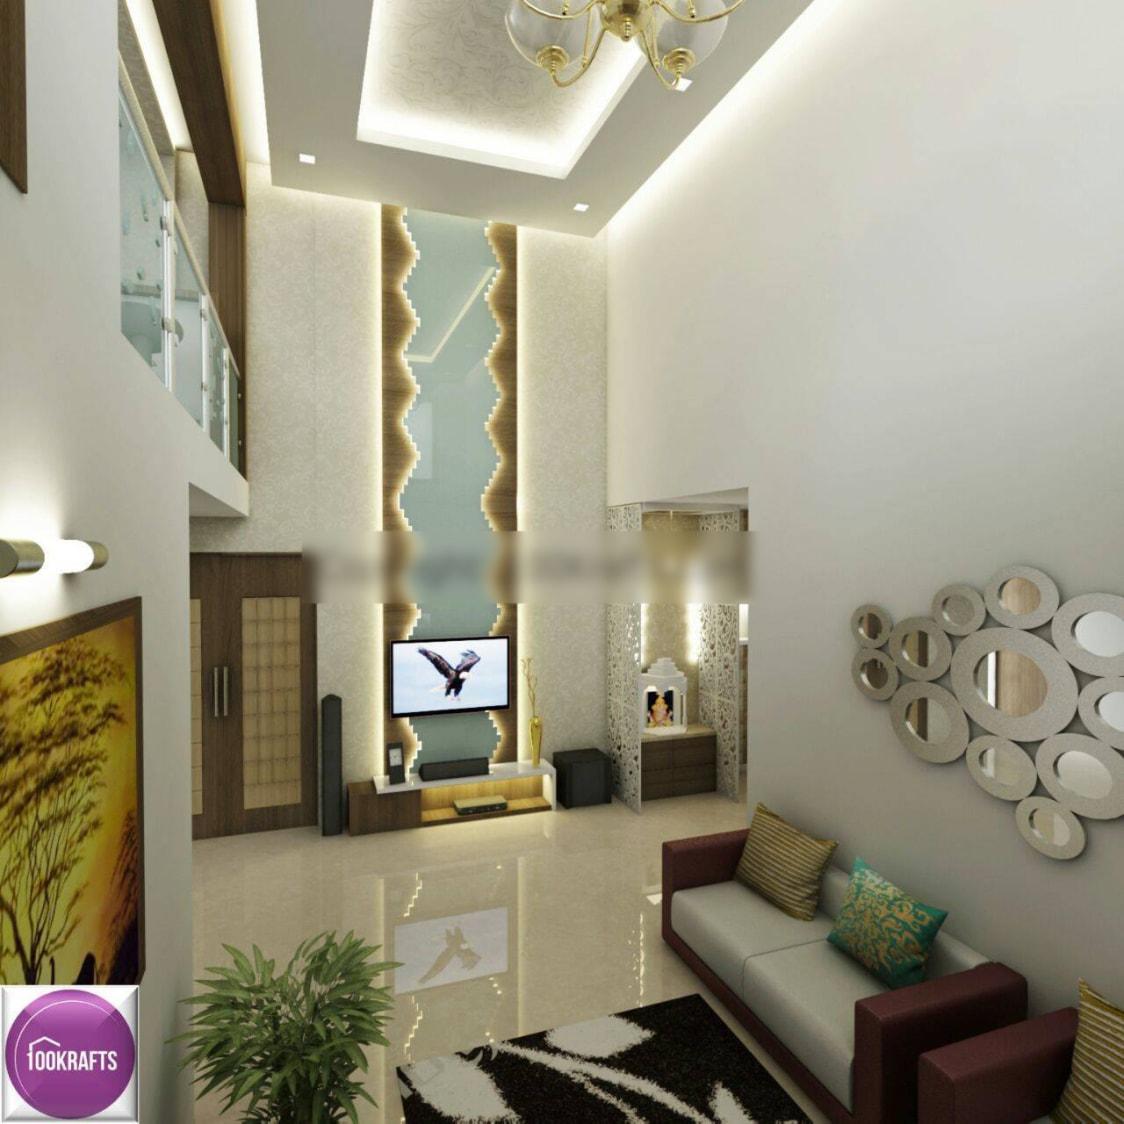 Modern Living Room with Artistic Decor by 100krafts Living-room Contemporary | Interior Design Photos & Ideas